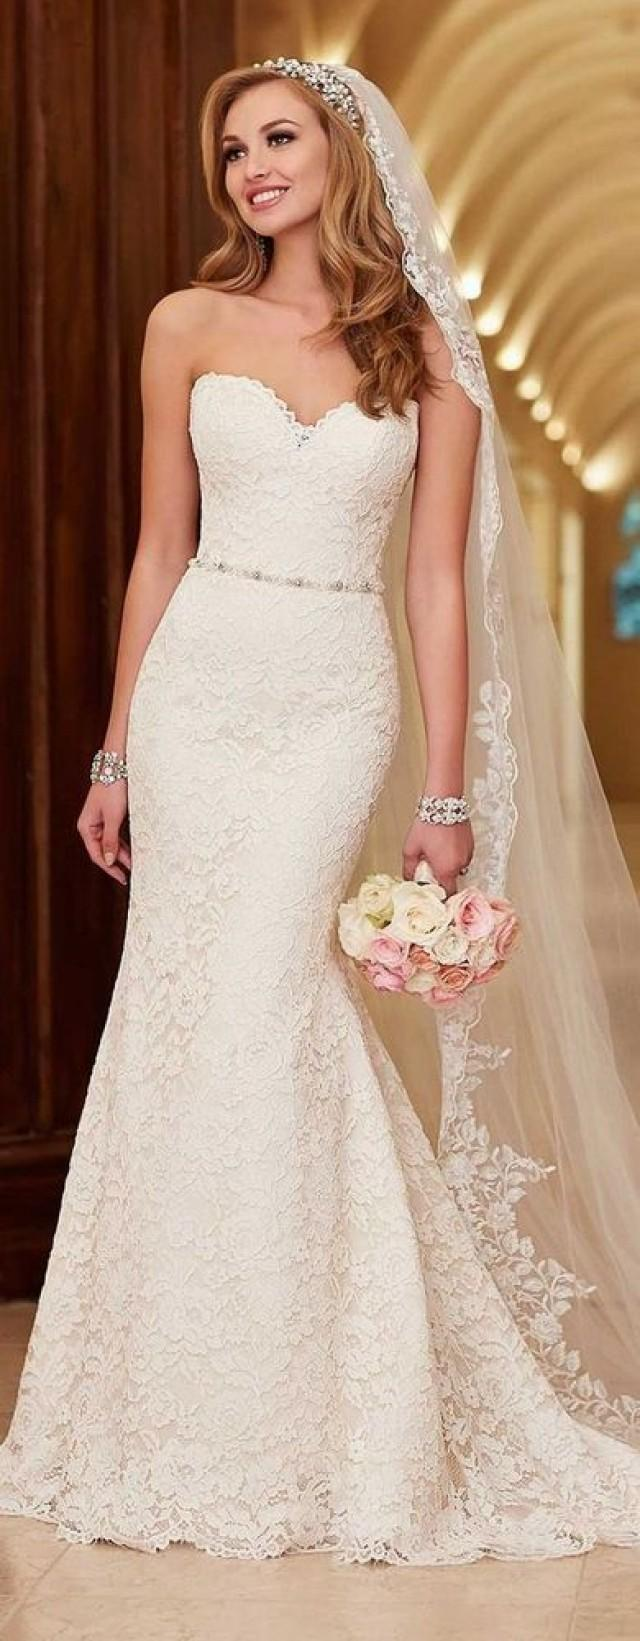 White Newest Wedding Dress,lace Bridal Dress, Strapless Weeding Dress Mermaid Wedding Dress